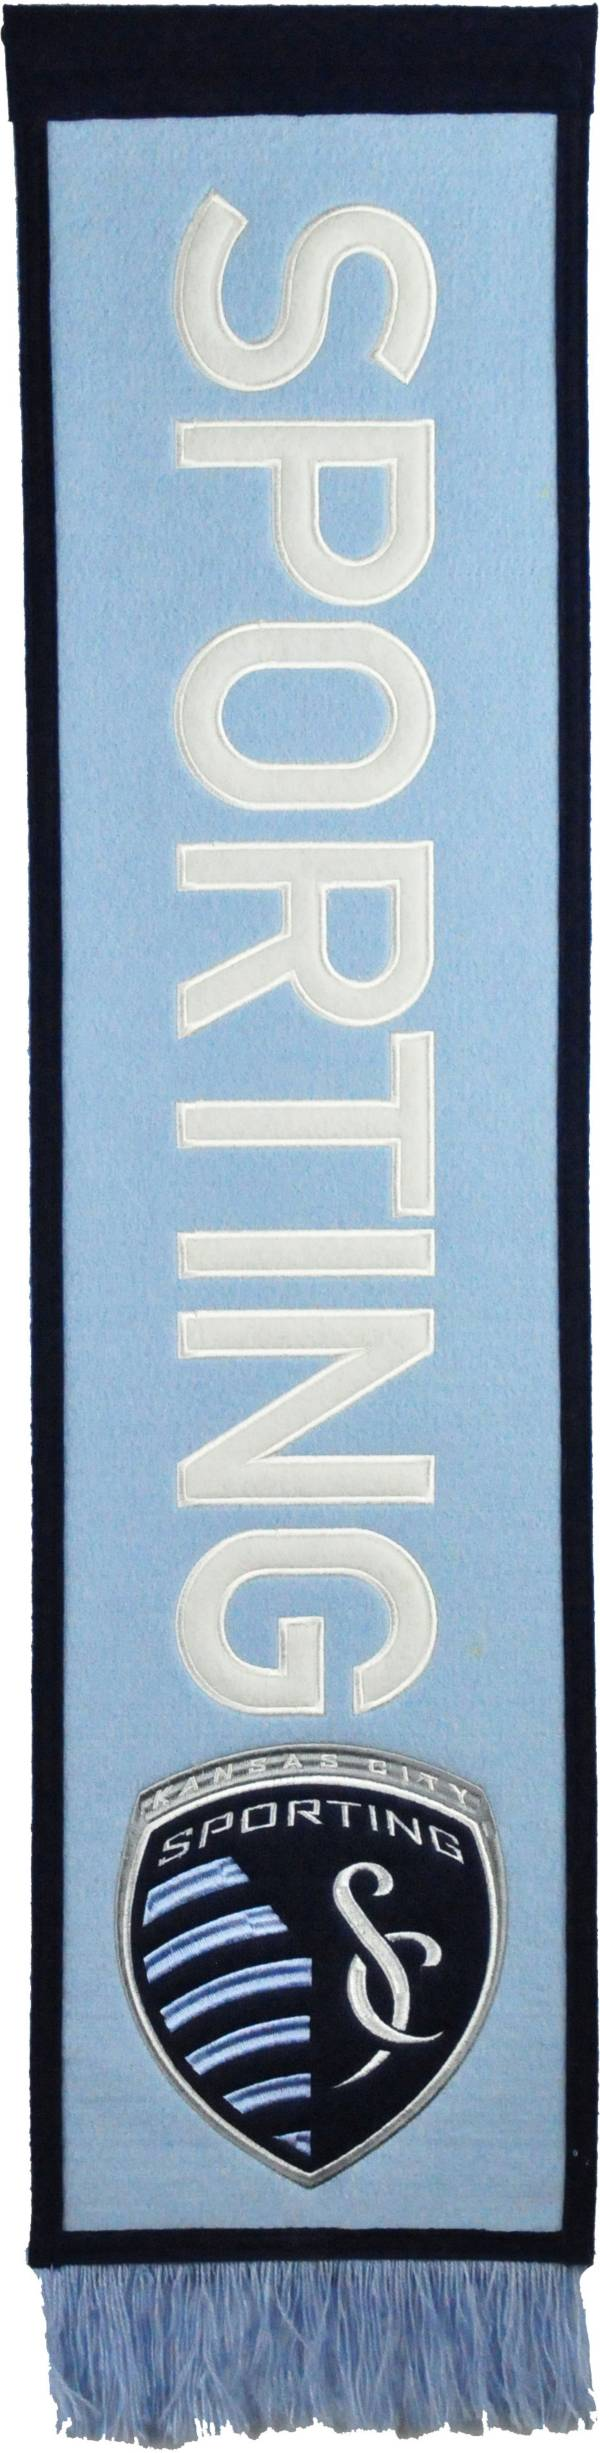 Winning Streak Sports Sporting Kansas City Scarf Team Banner product image